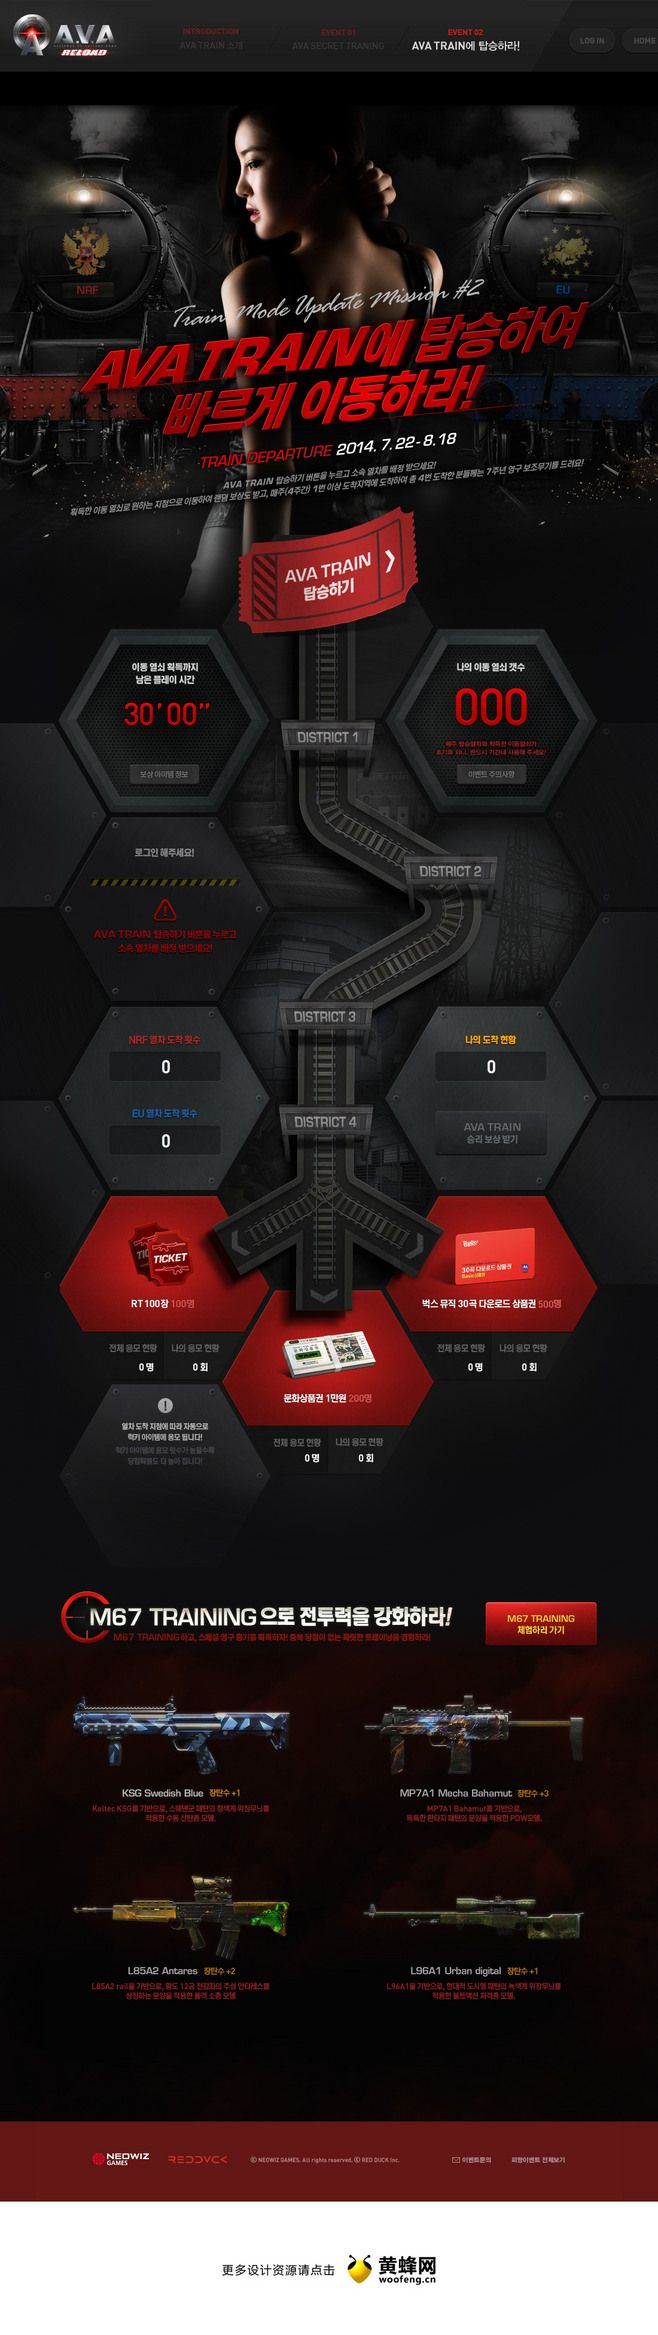 pmang游戏专题,来源自黄蜂网http...